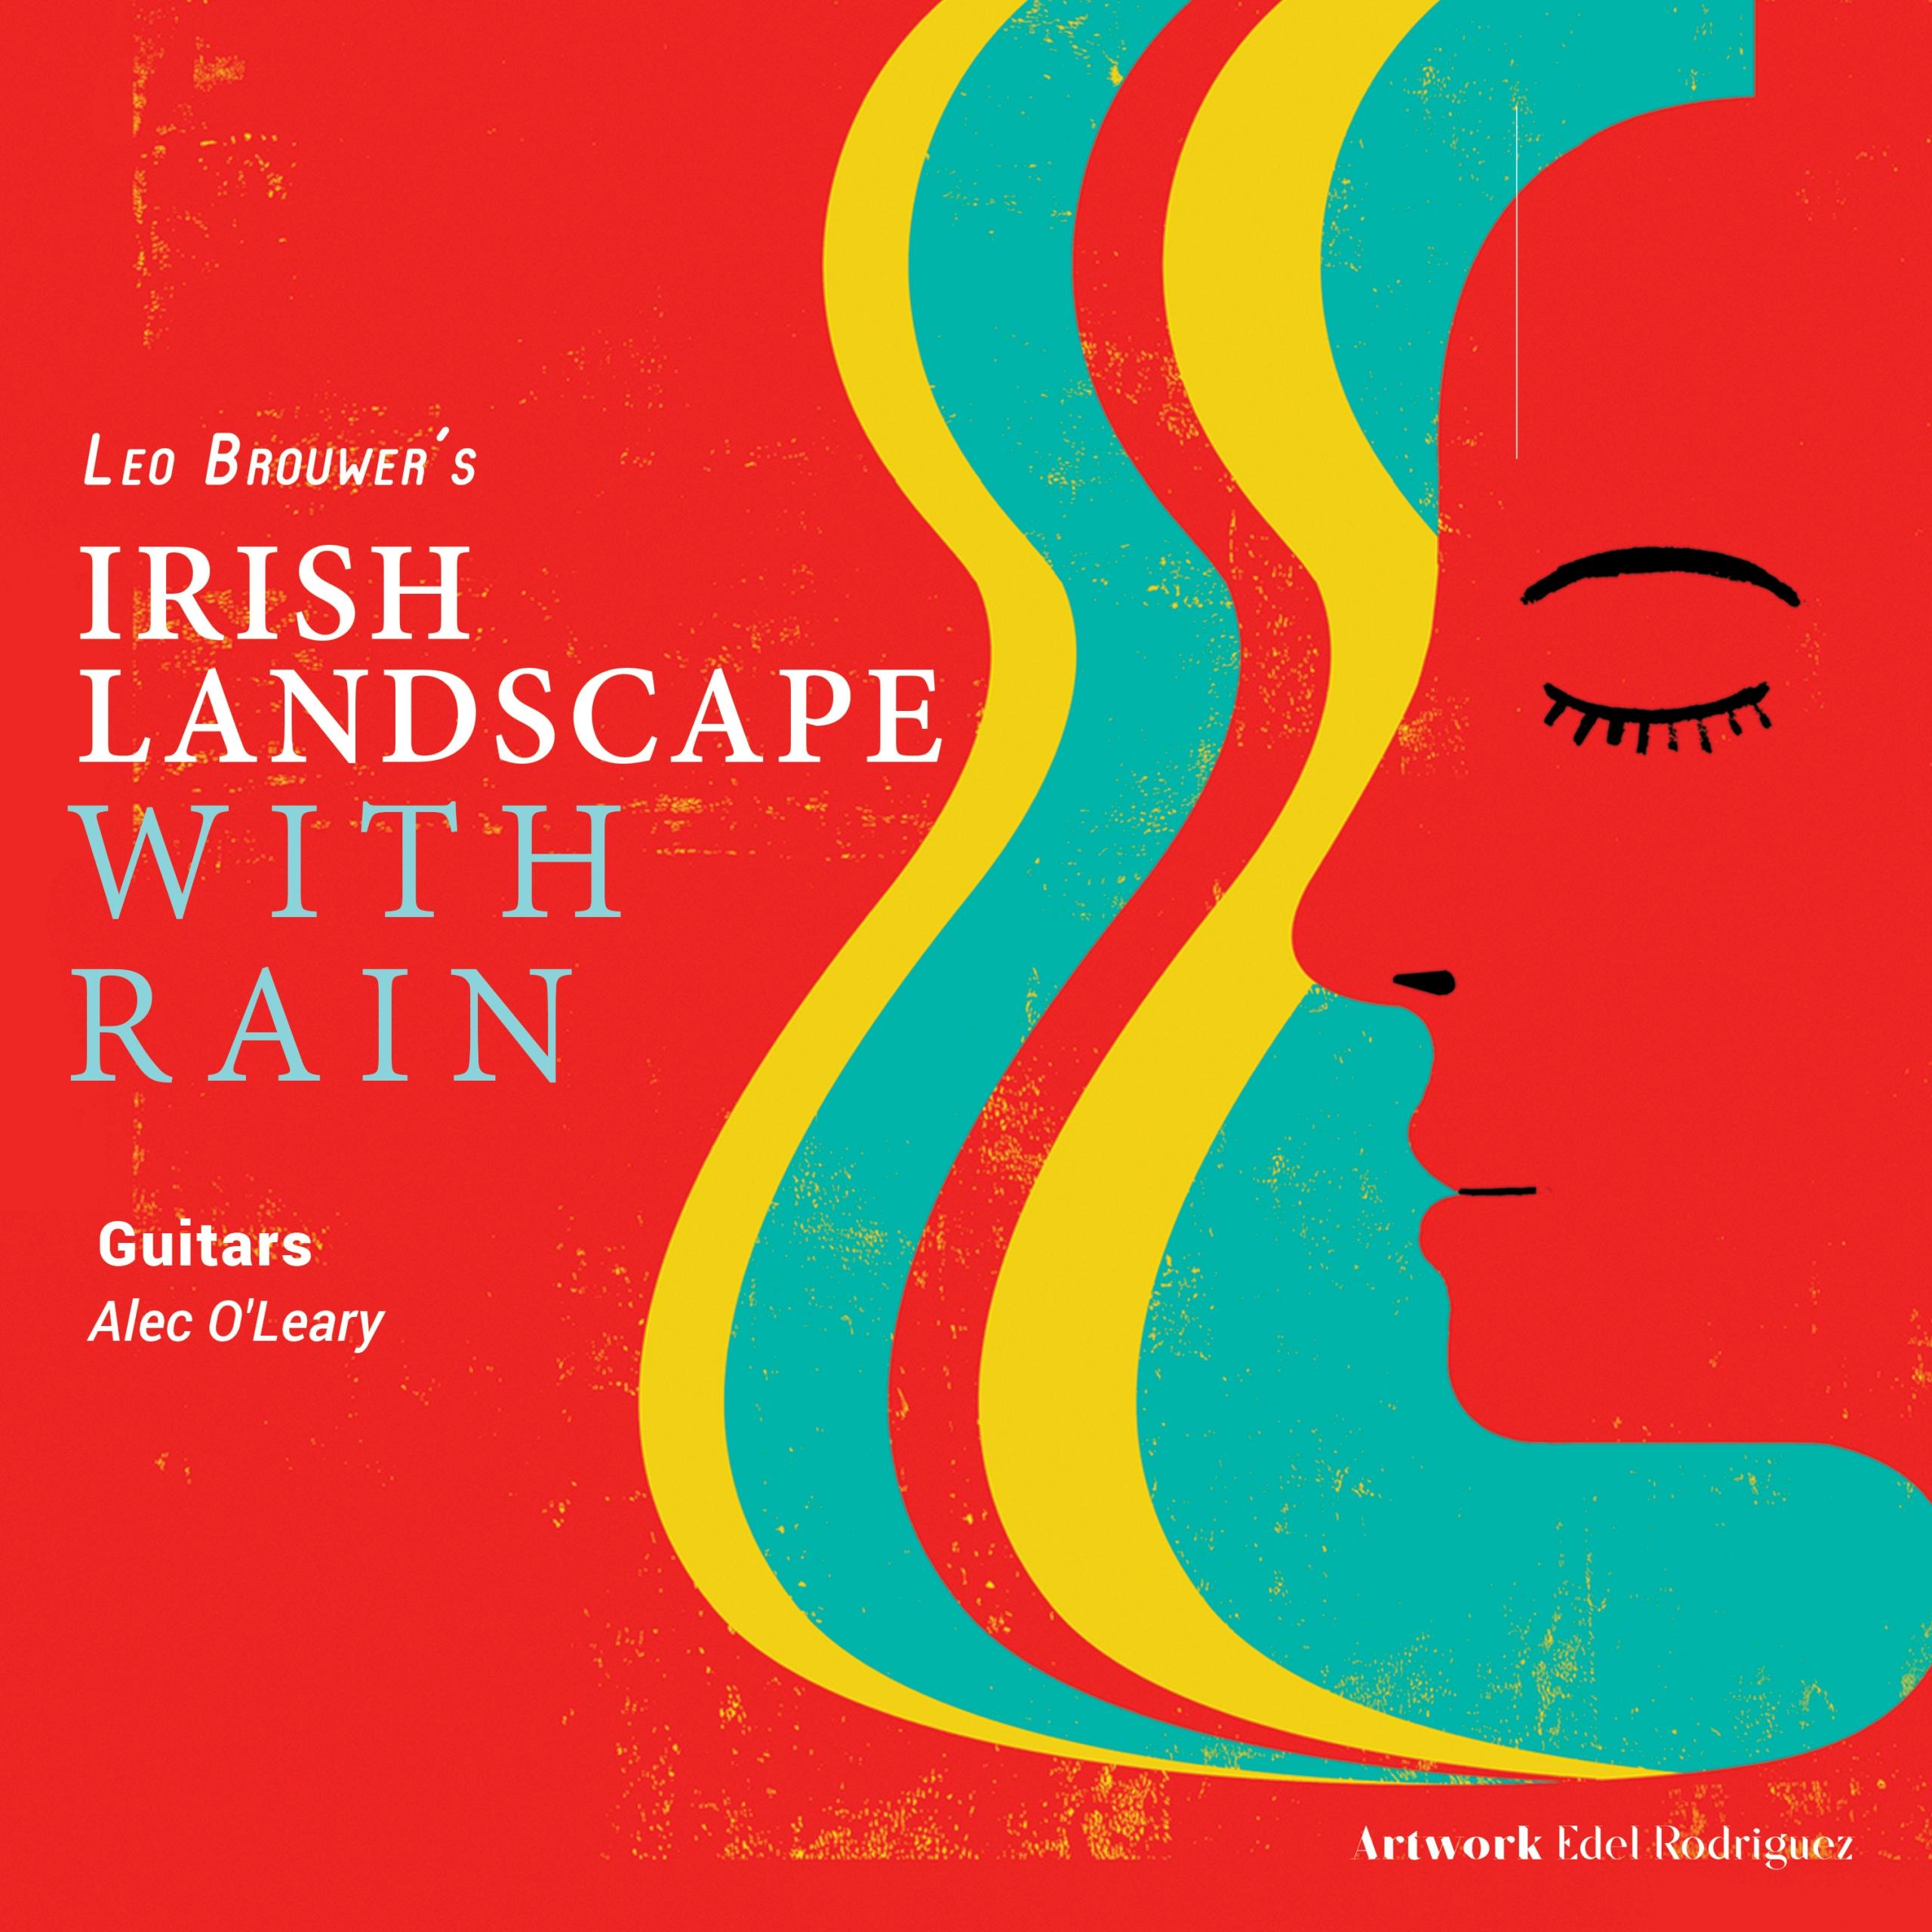 Irish Landscape with Rain cd cover